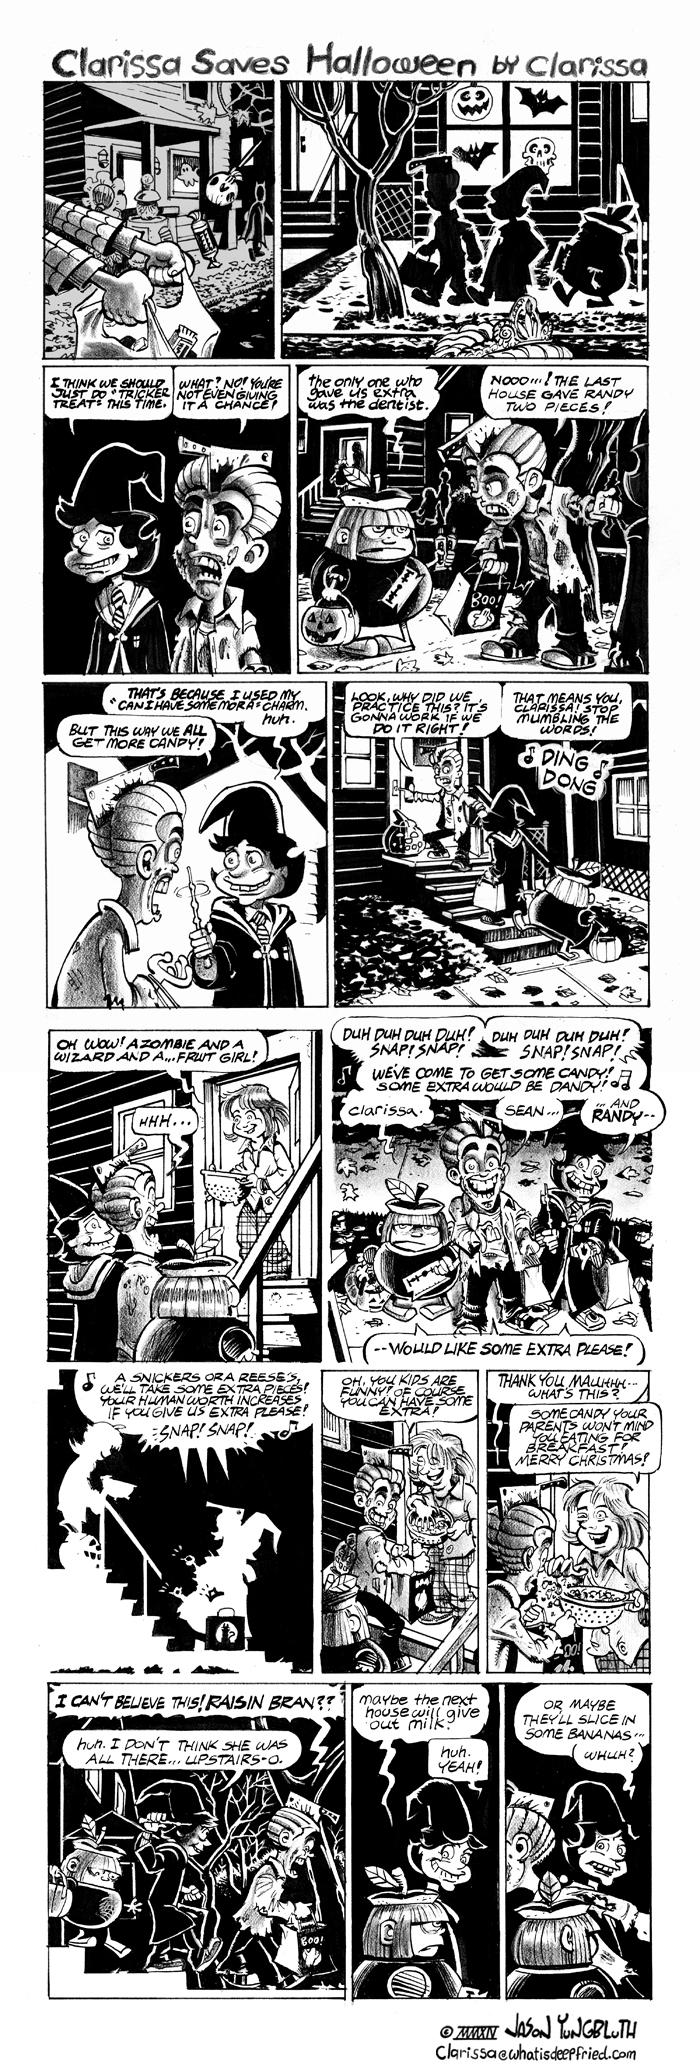 Clarissa Saves Halloween-Part 1